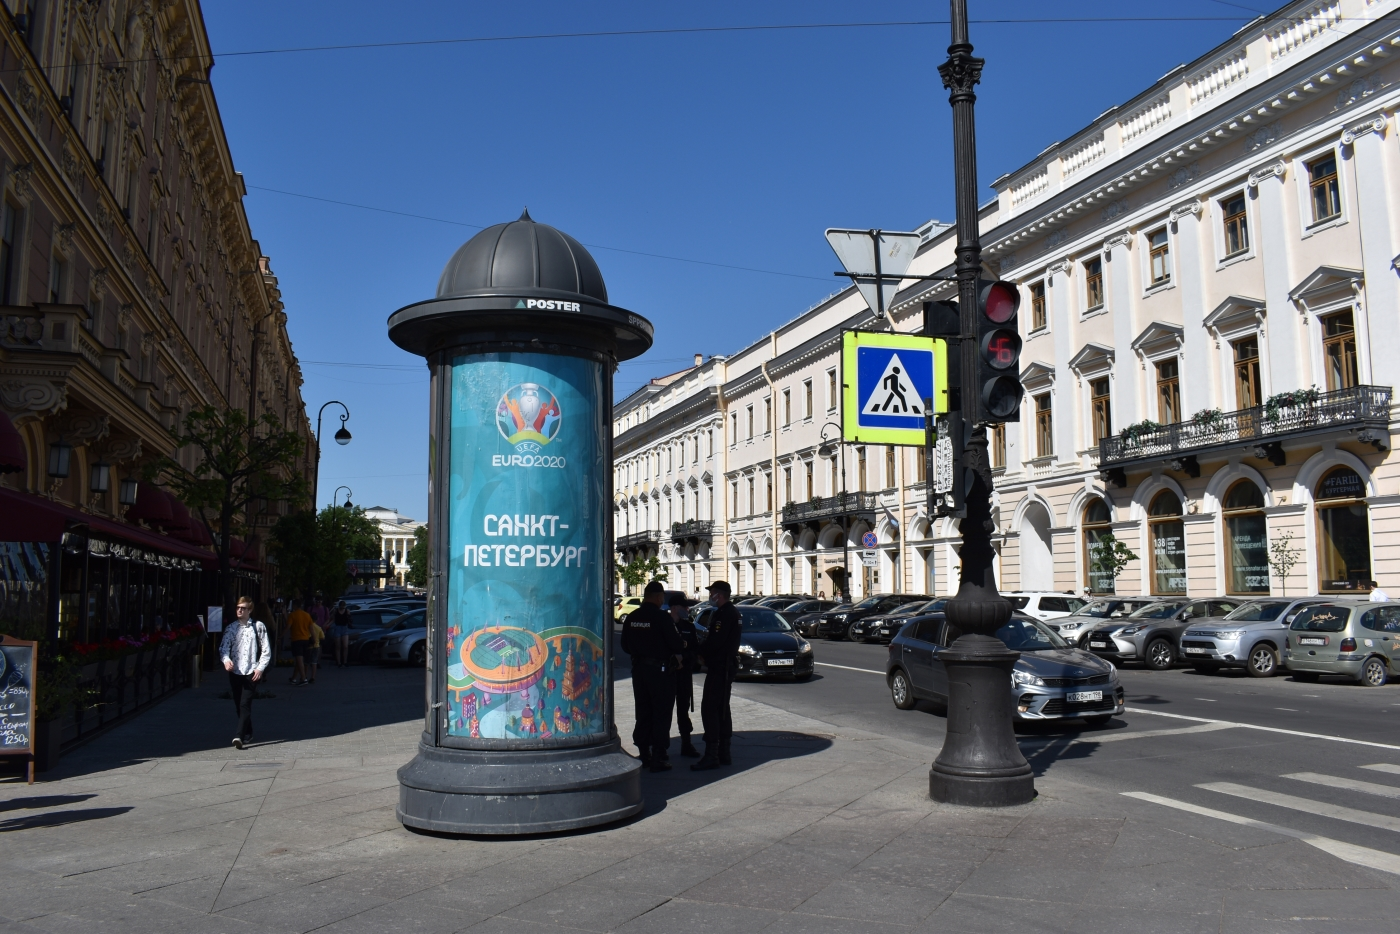 Санкт-Петербург. Улицы Санкт-Петербурга. Евро-2020.